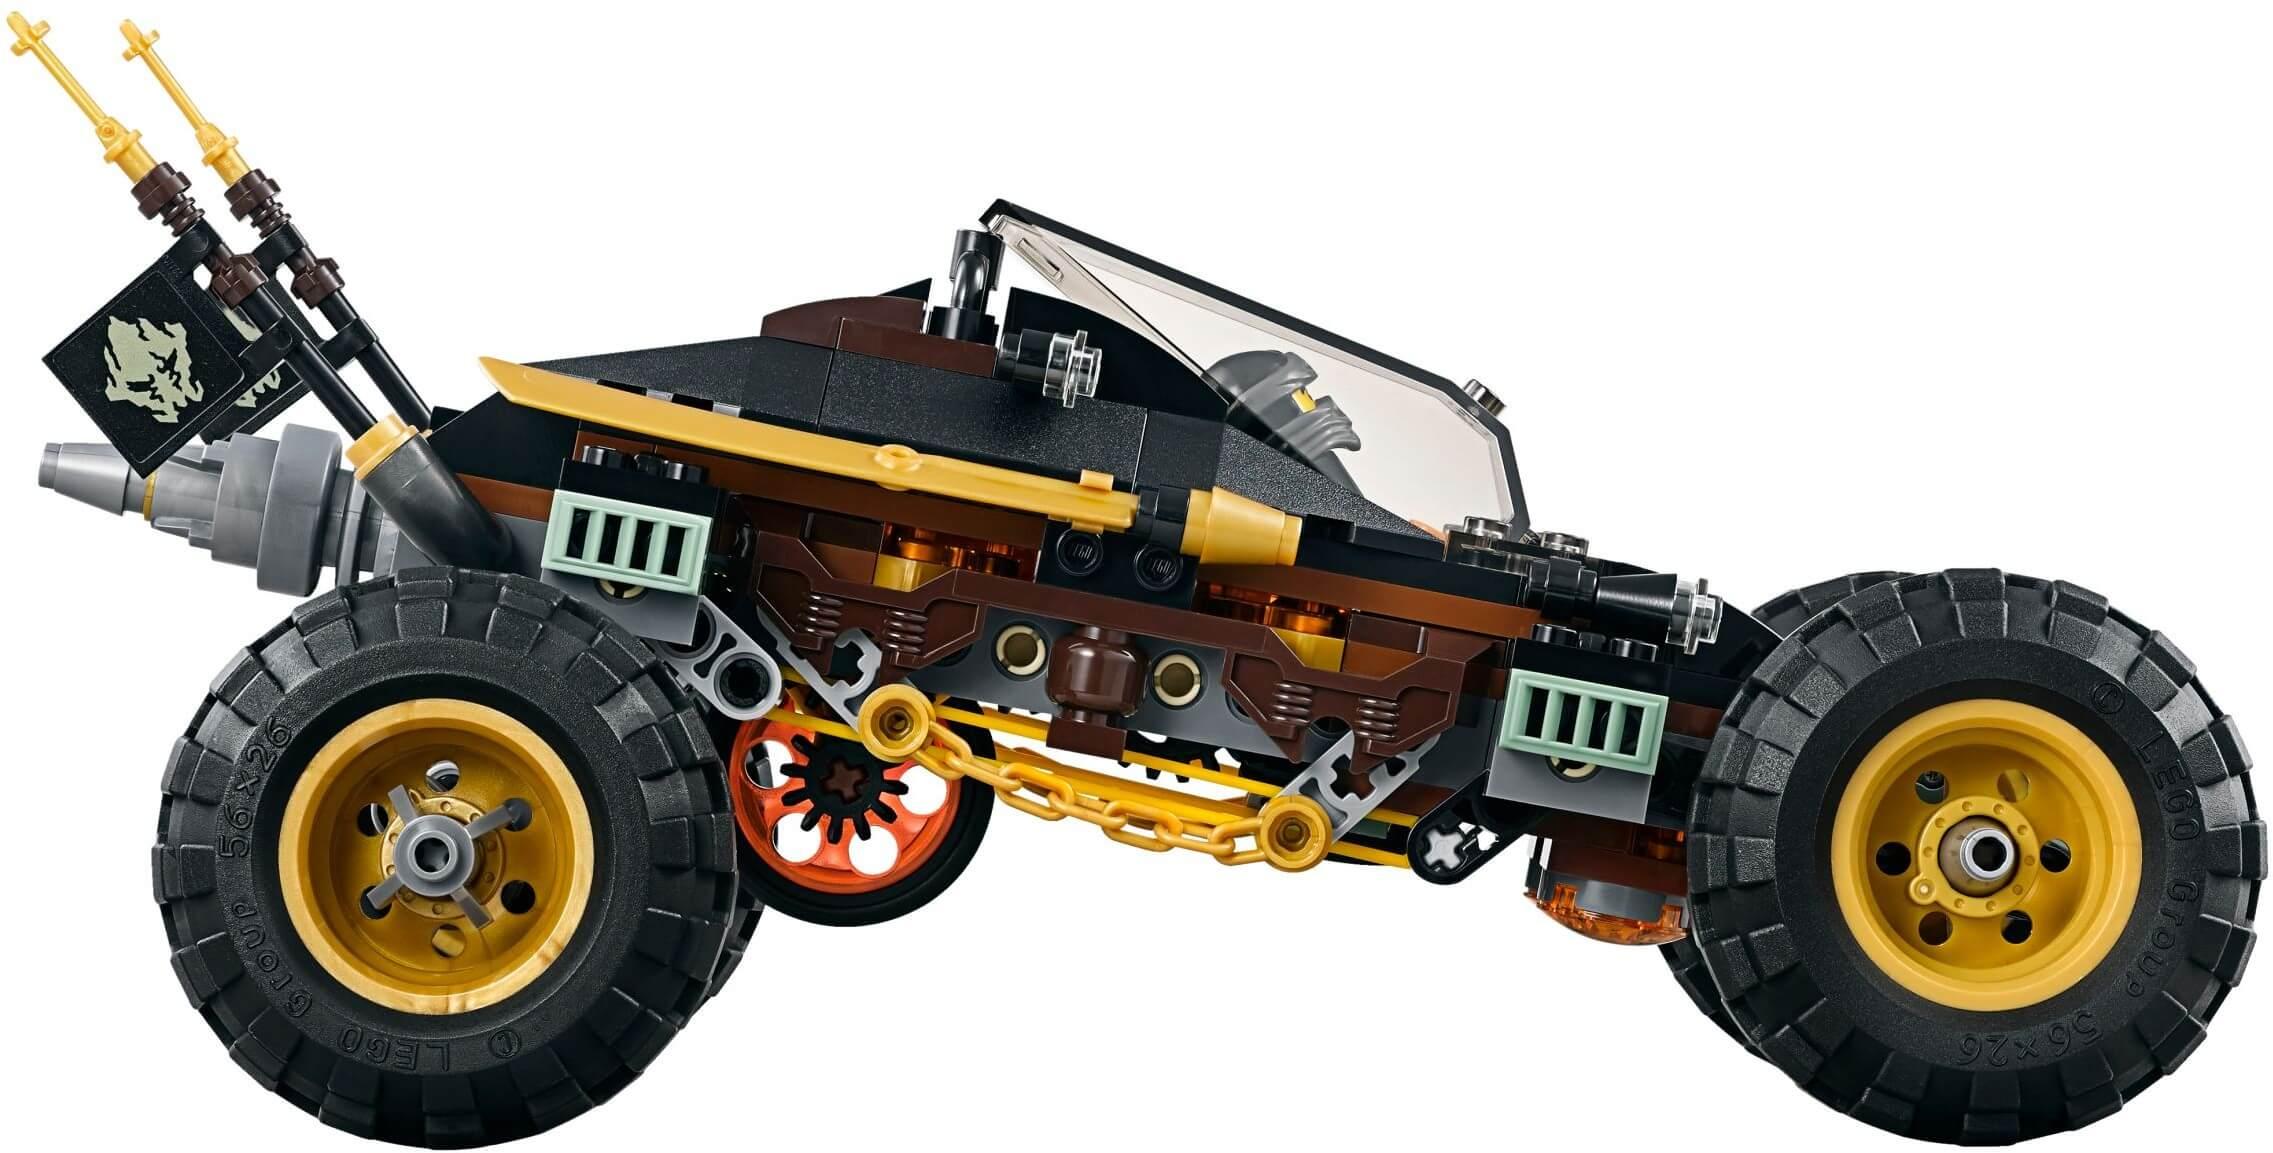 Mua đồ chơi LEGO 70589 - LEGO Ninjago 70589 - Siêu Xe Địa Hình của Cole RX (LEGO Ninjago Rock Roader 70589)